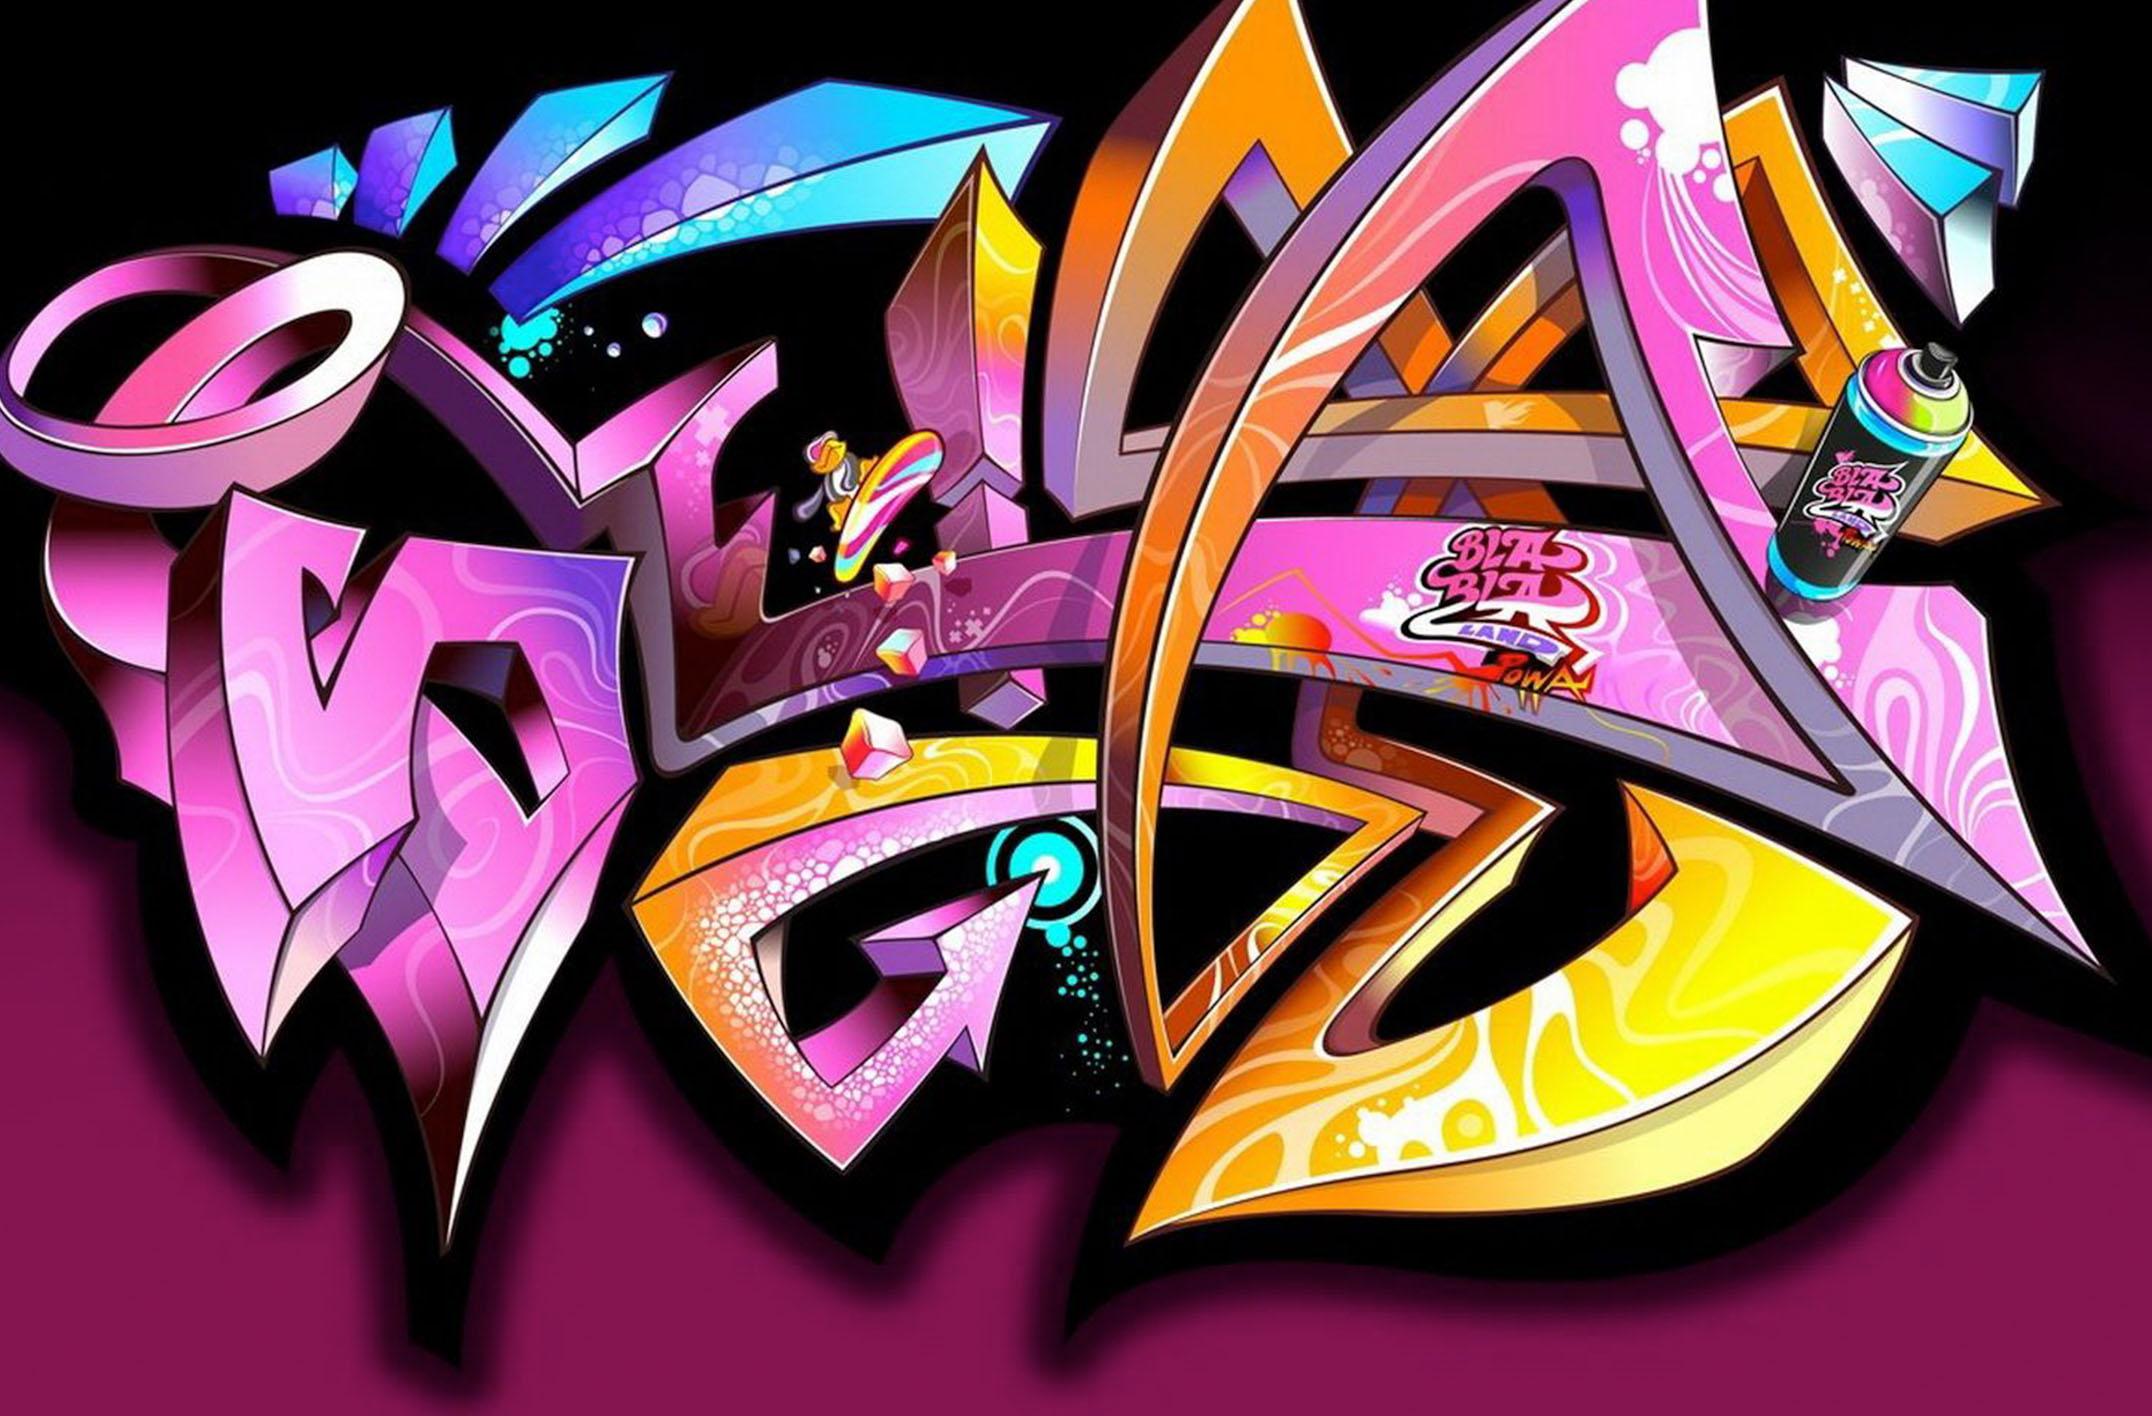 GRAFF014